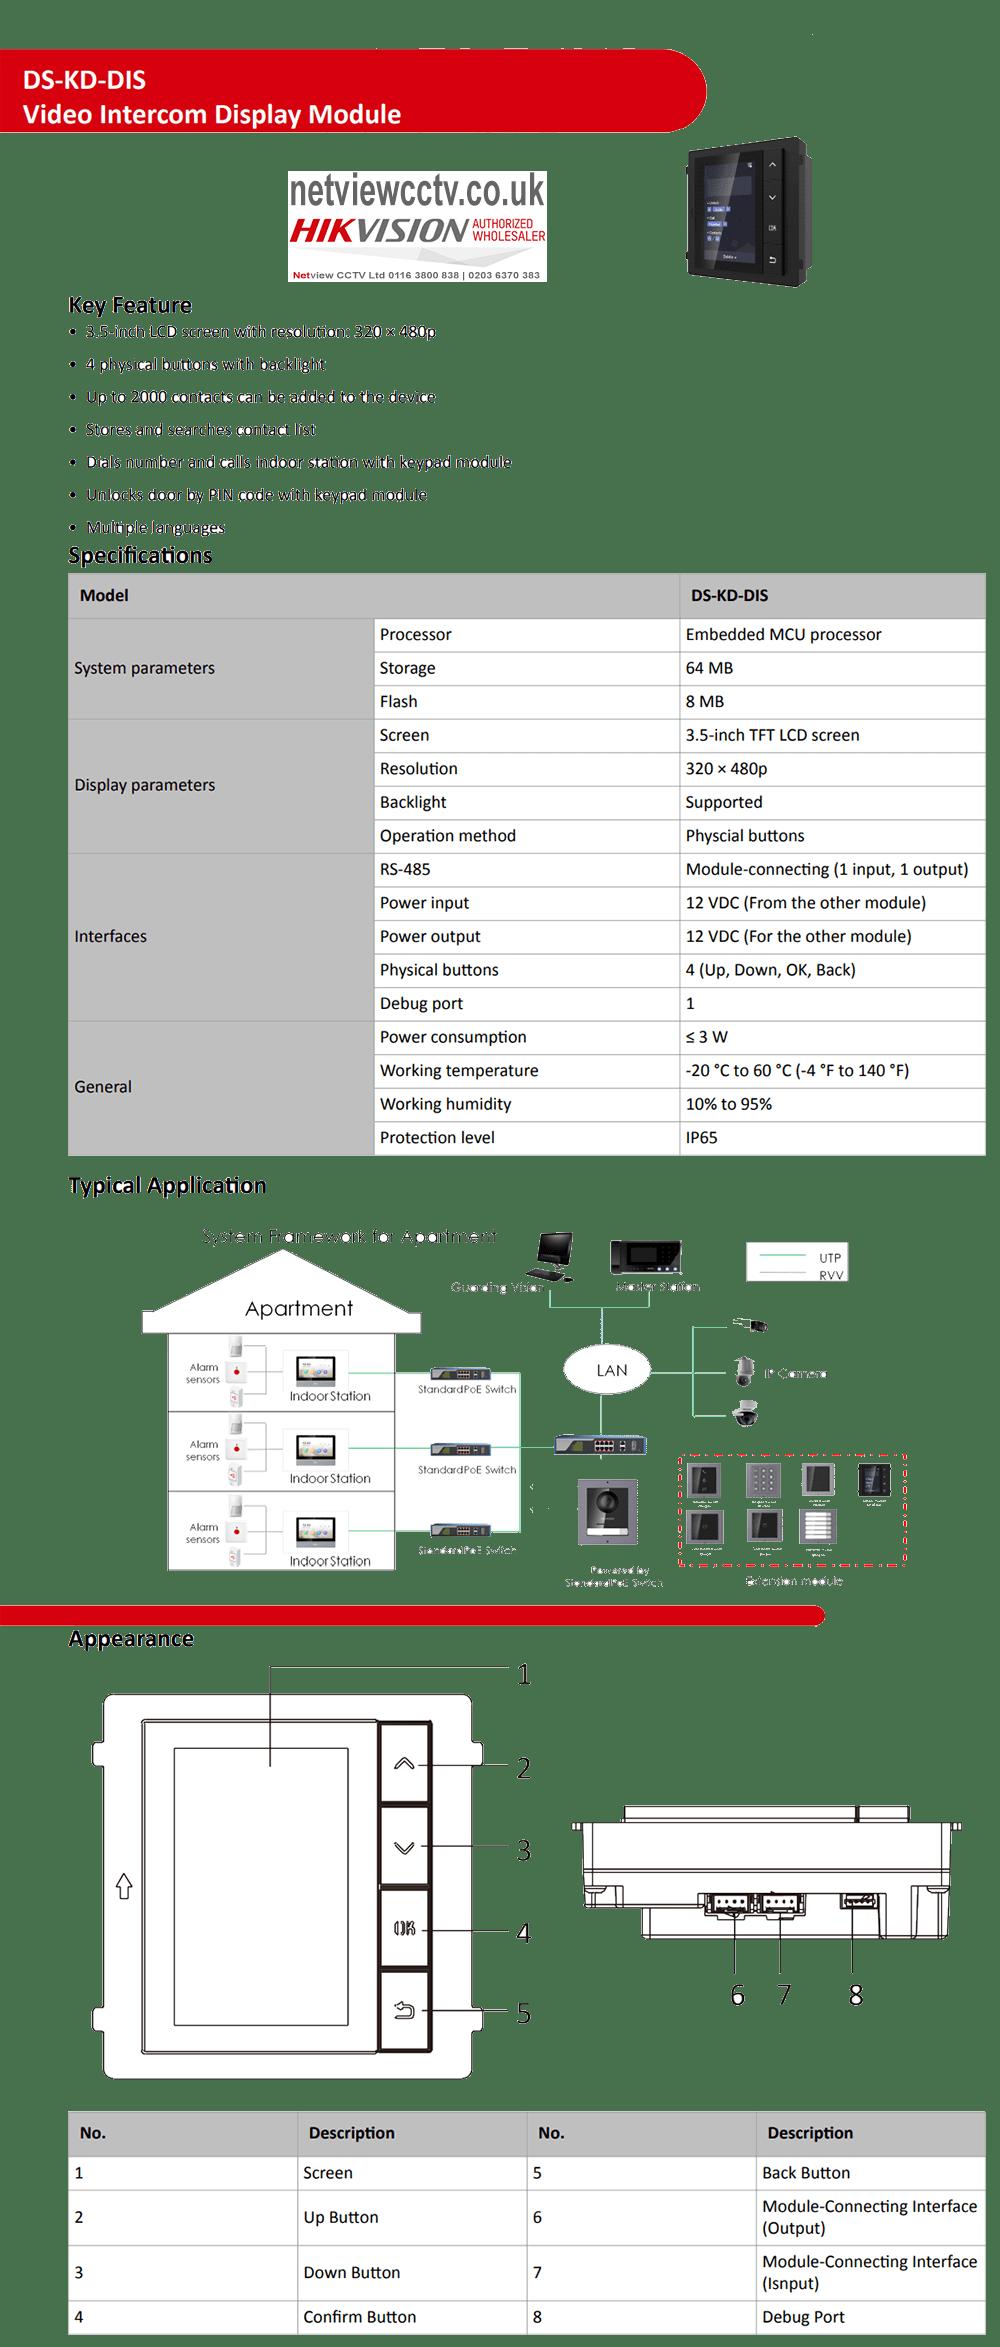 Hikvision DS-KD-DIS Modular Display Module for Video Intercom